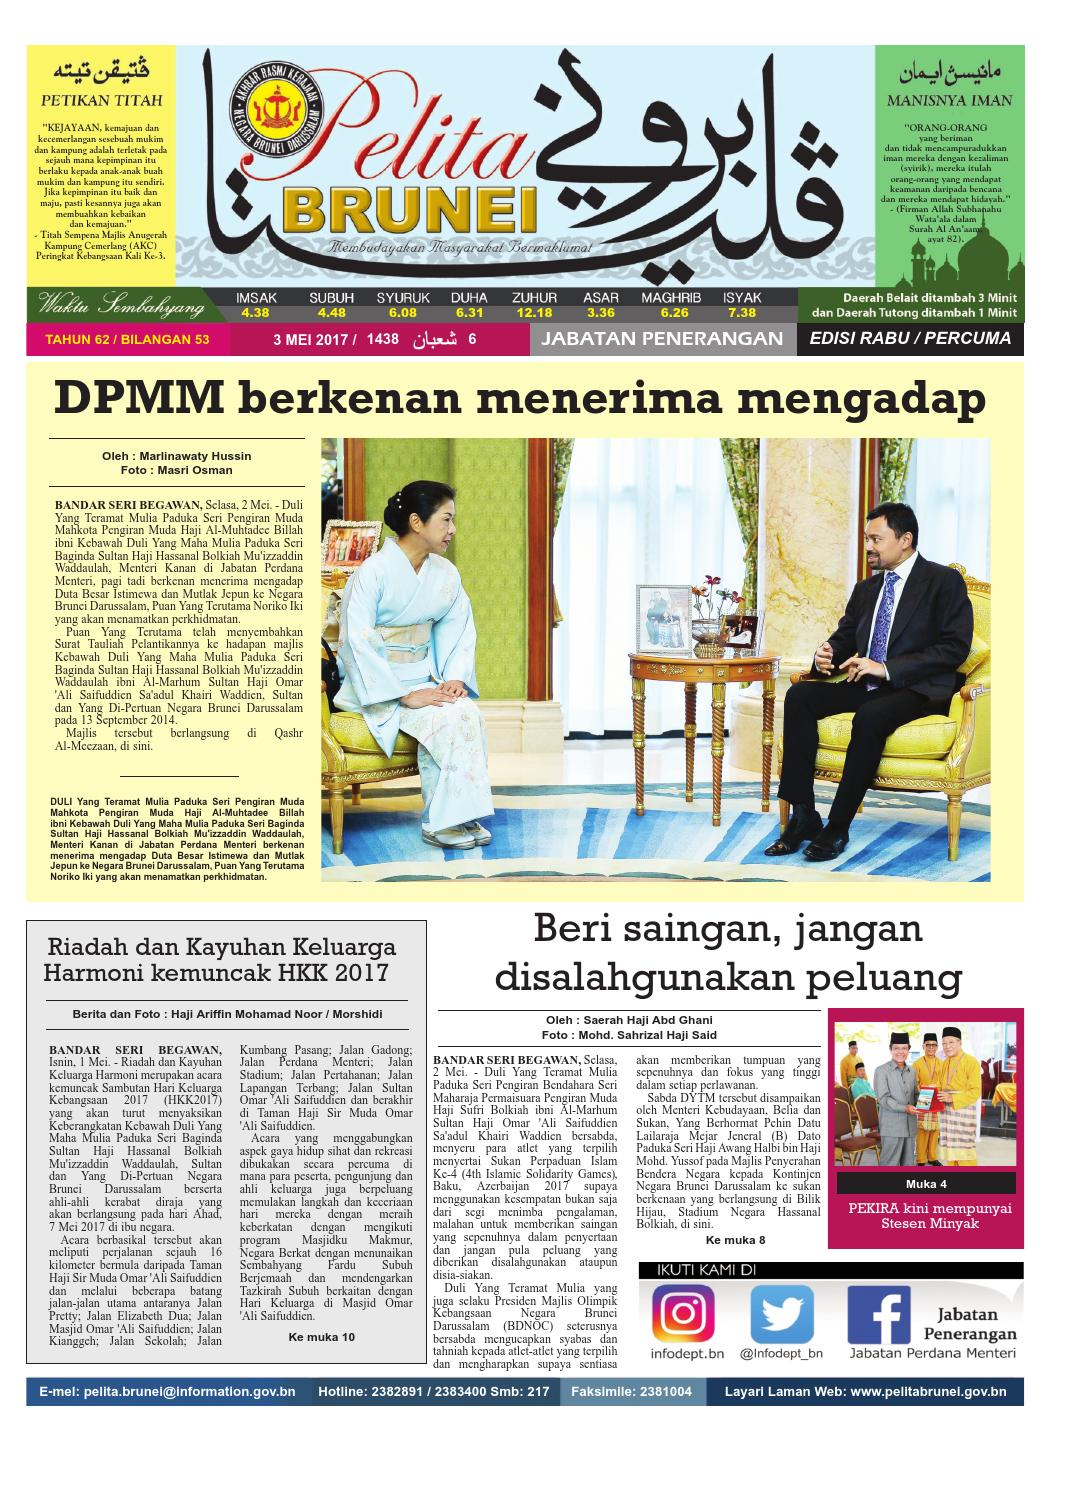 Pelita Brunei Rabu 03 Mei 2017 By Putera Katak Brunei Issuu